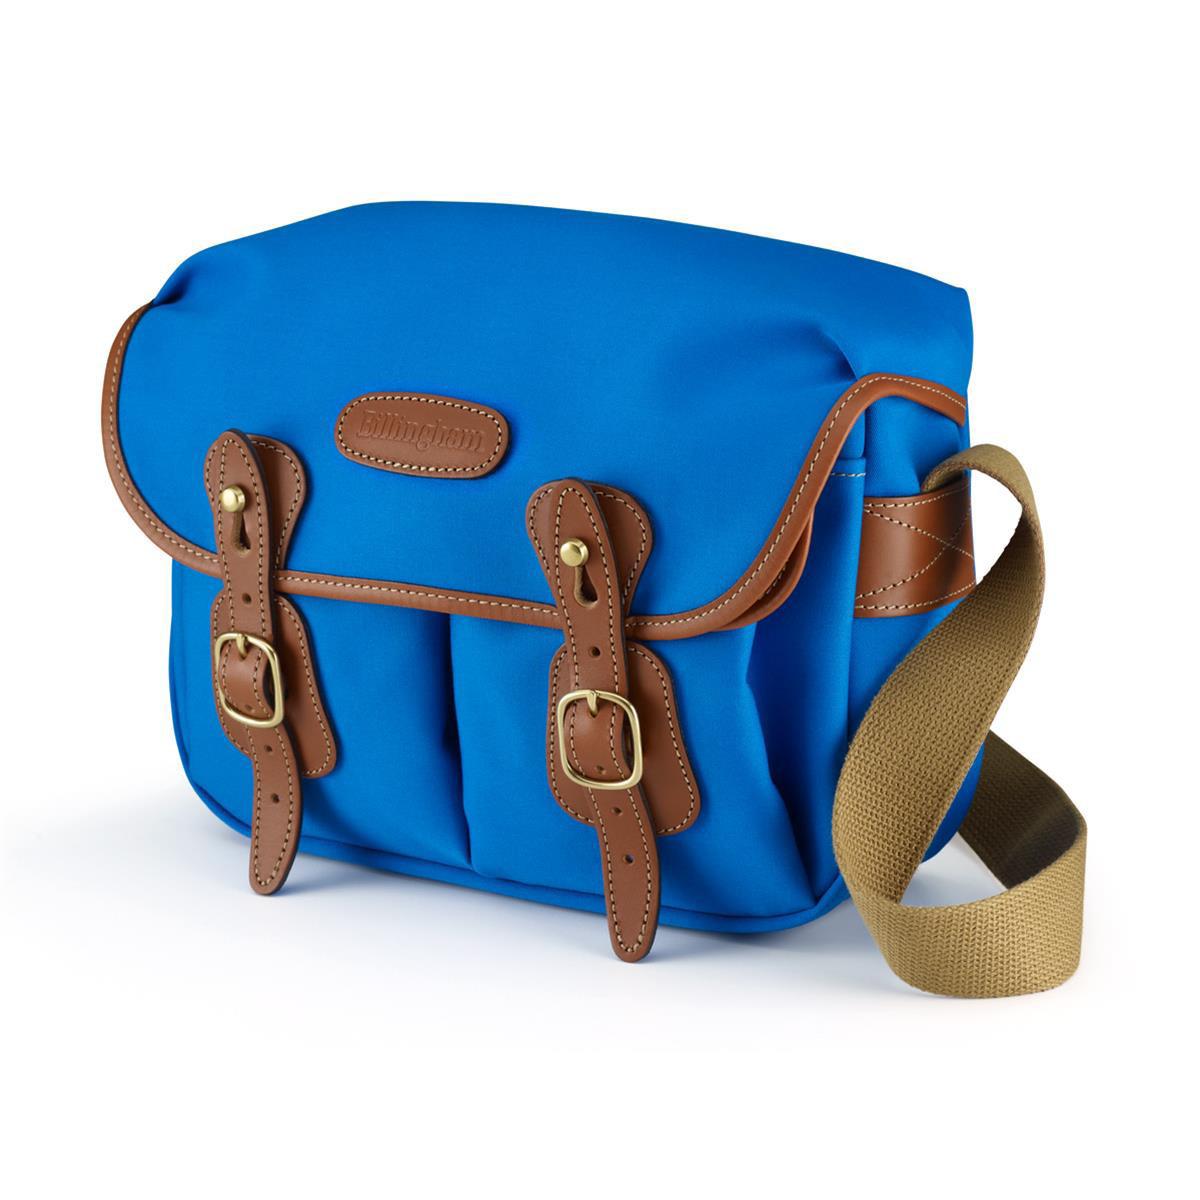 Billigham Hadley Small Blue/Tan